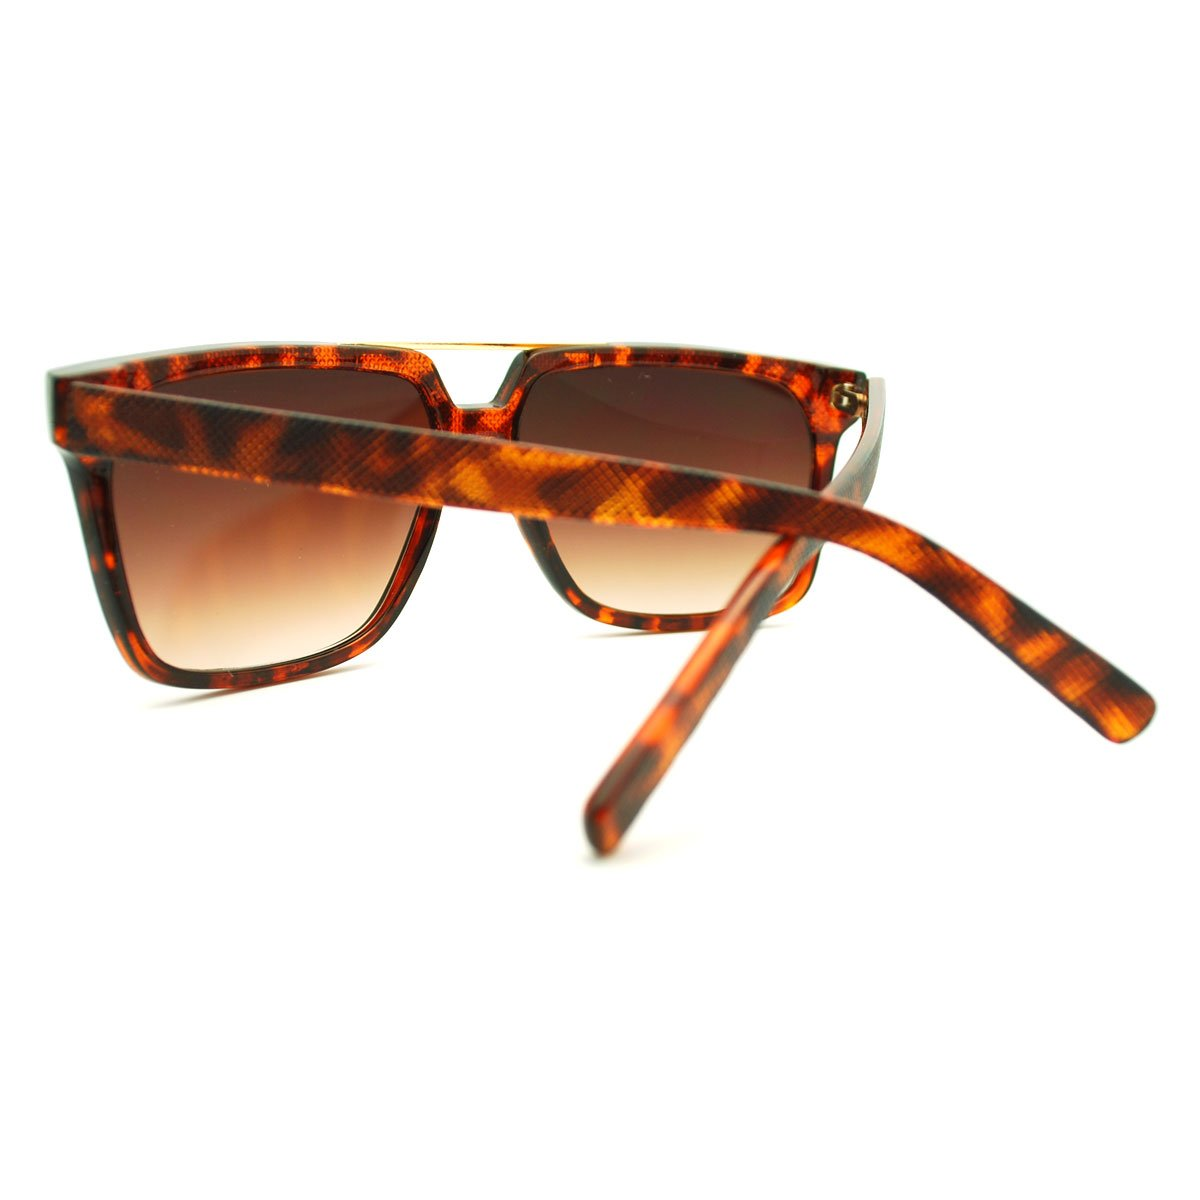 Flat Top Square Sunglasses Unisex Truly Retro Stylish Fashion Shades